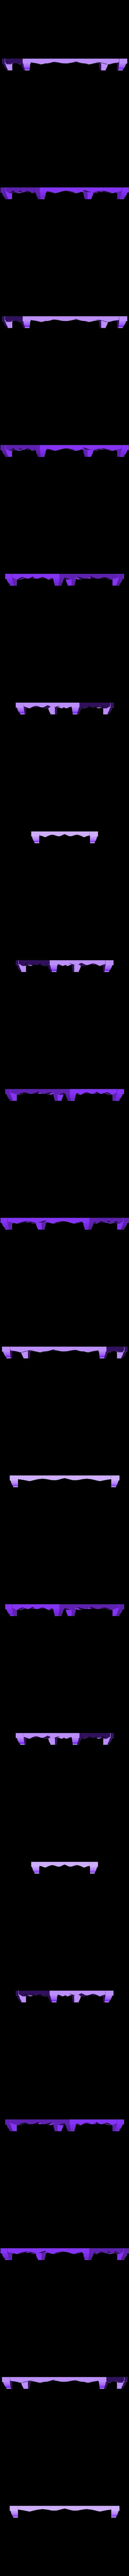 Tapion's Music Box - Bottom.stl Télécharger fichier STL Tapion Music Box - Dragon Ball • Plan pour impression 3D, BODY3D